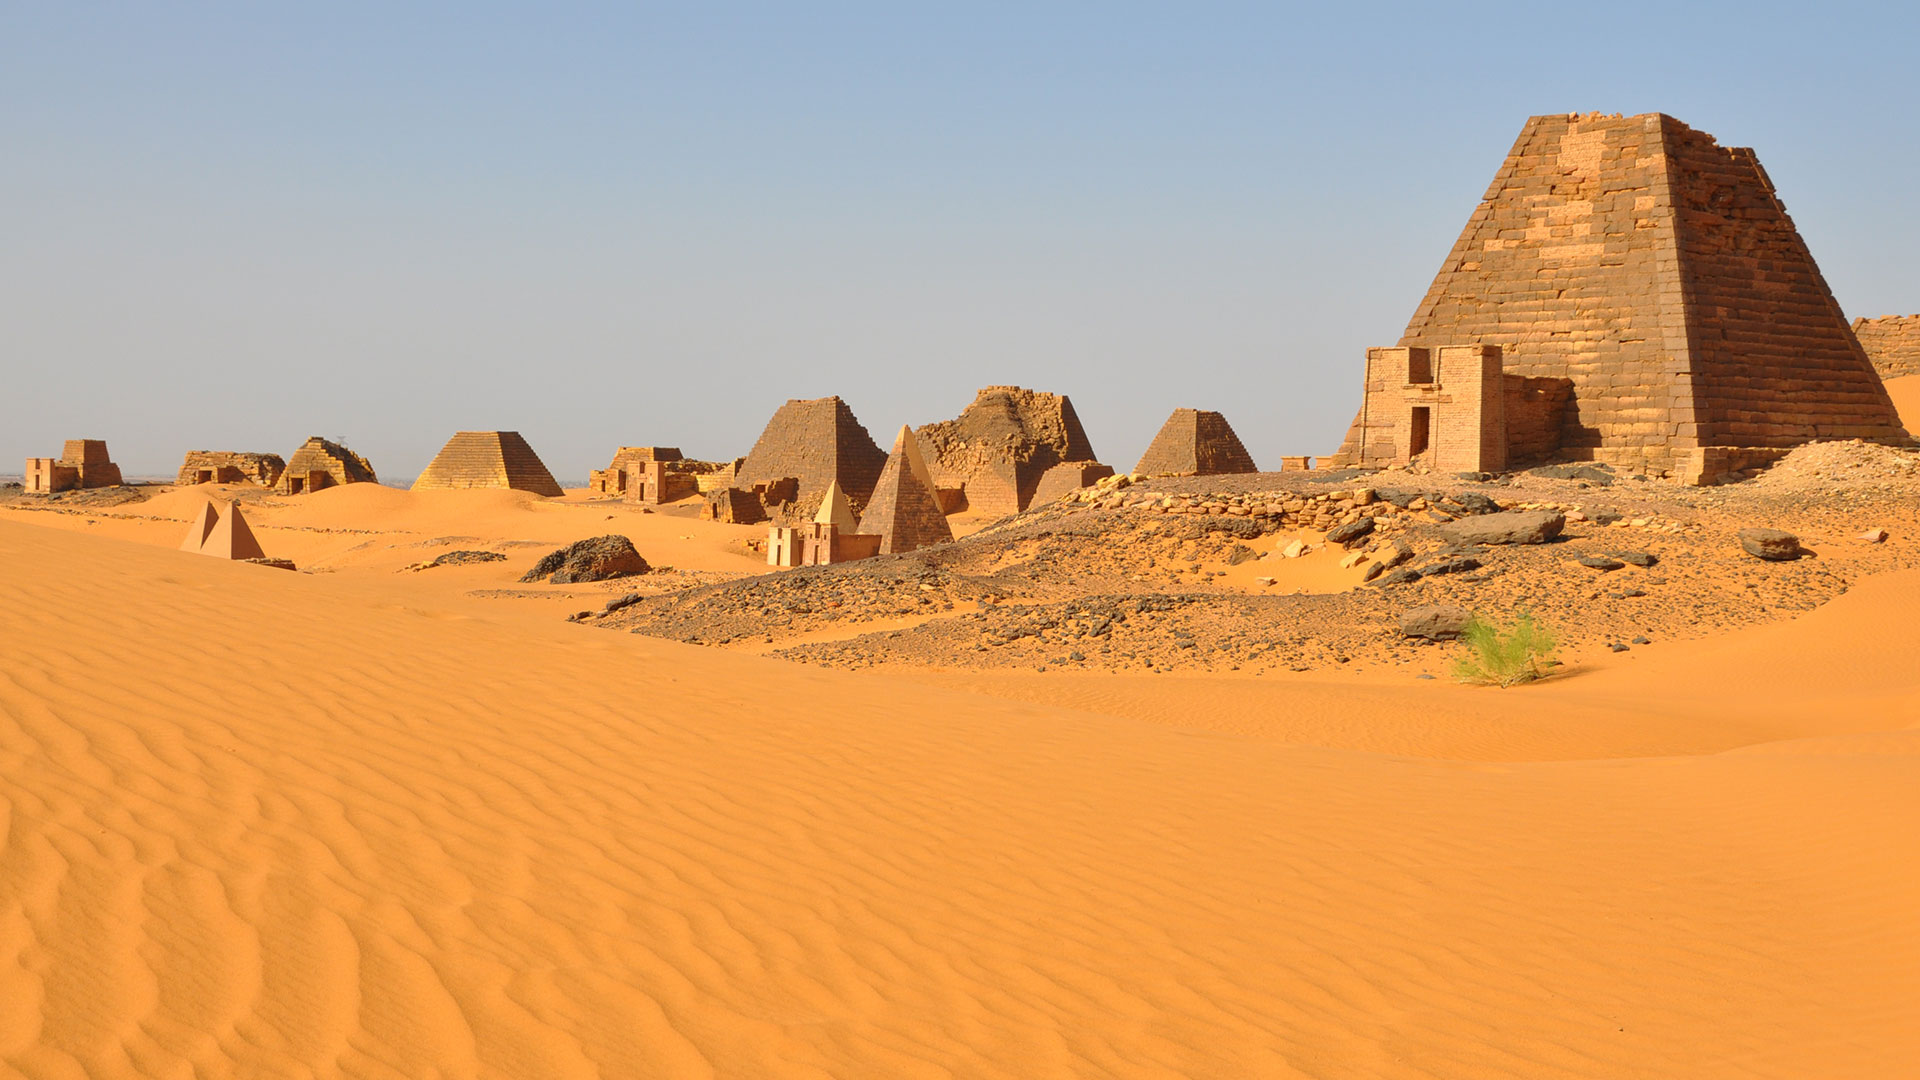 Nubia hero asset